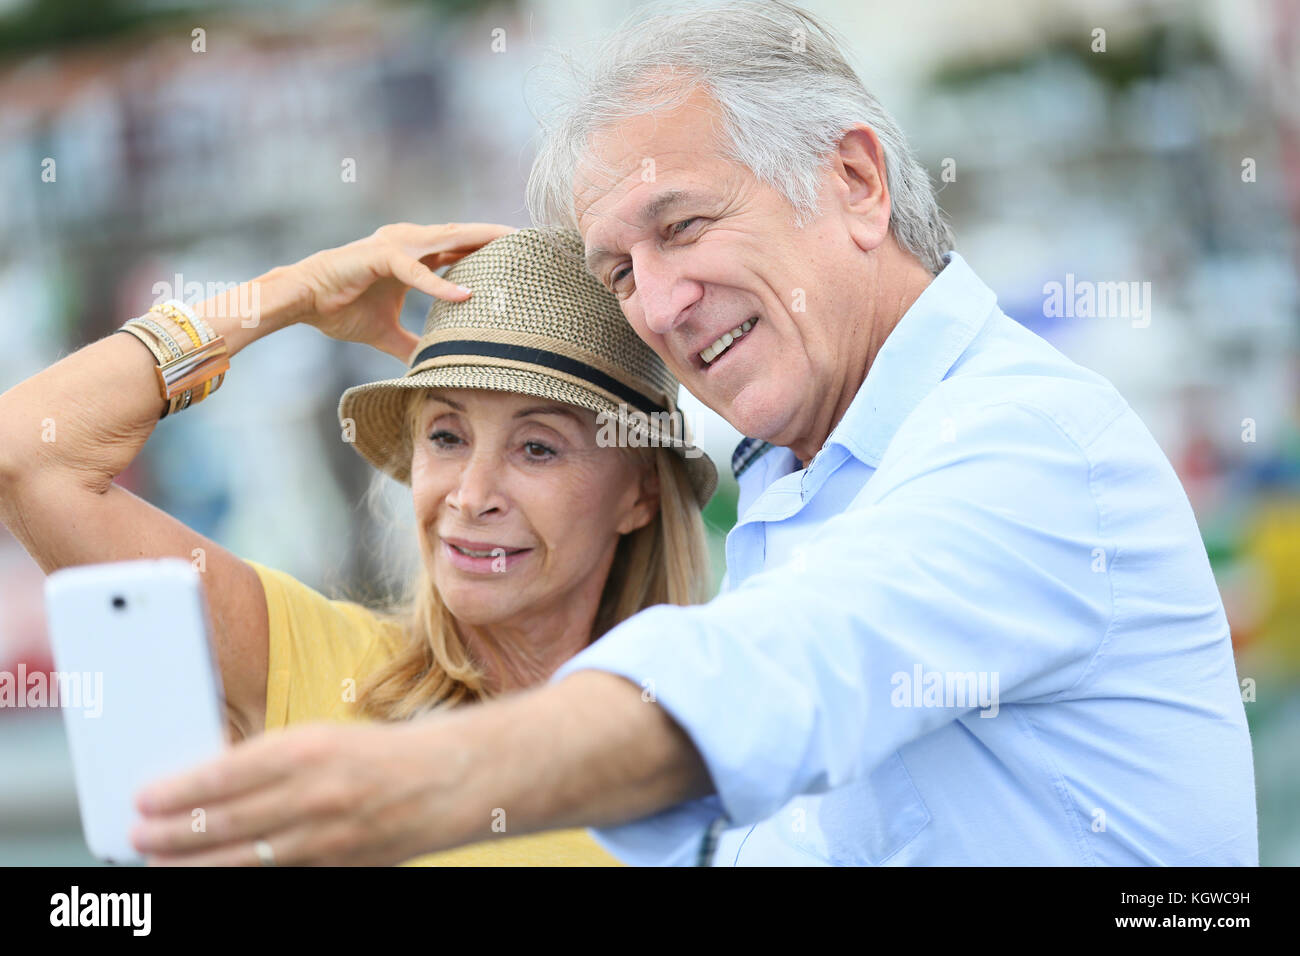 Couple de touristes de prendre photo avec smartphone Photo Stock